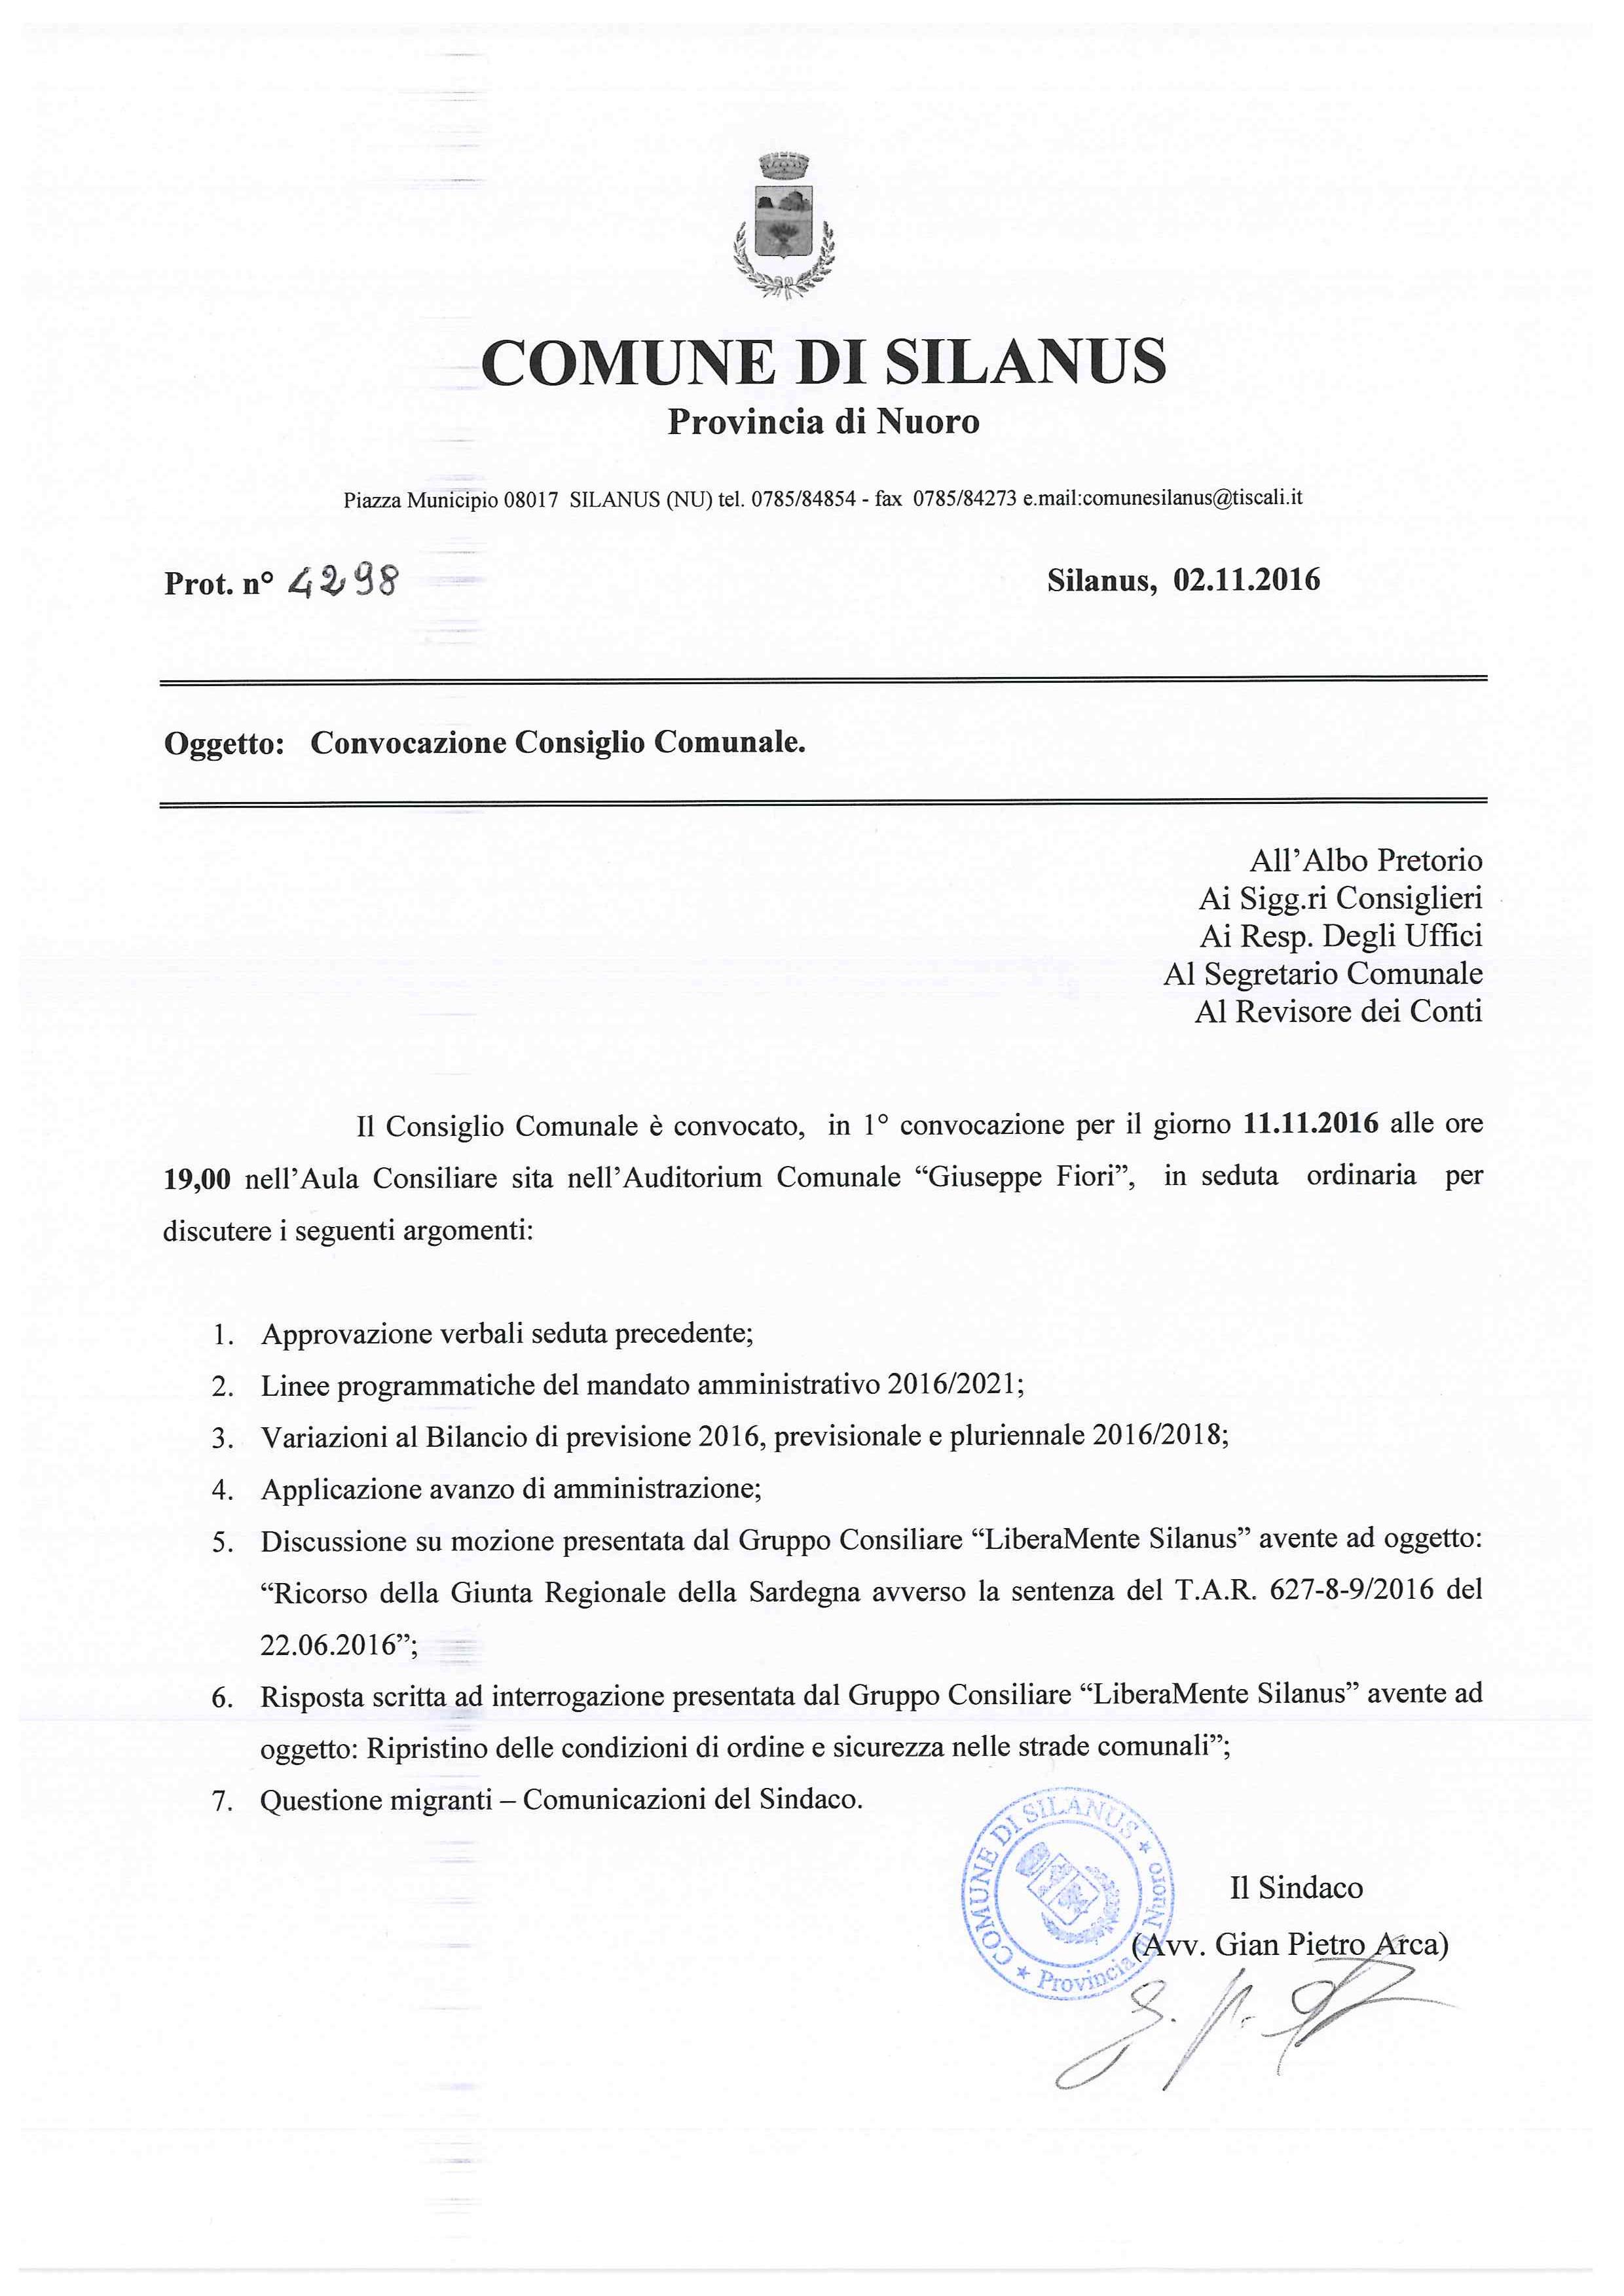 convocazione-c-c-11-11-2016